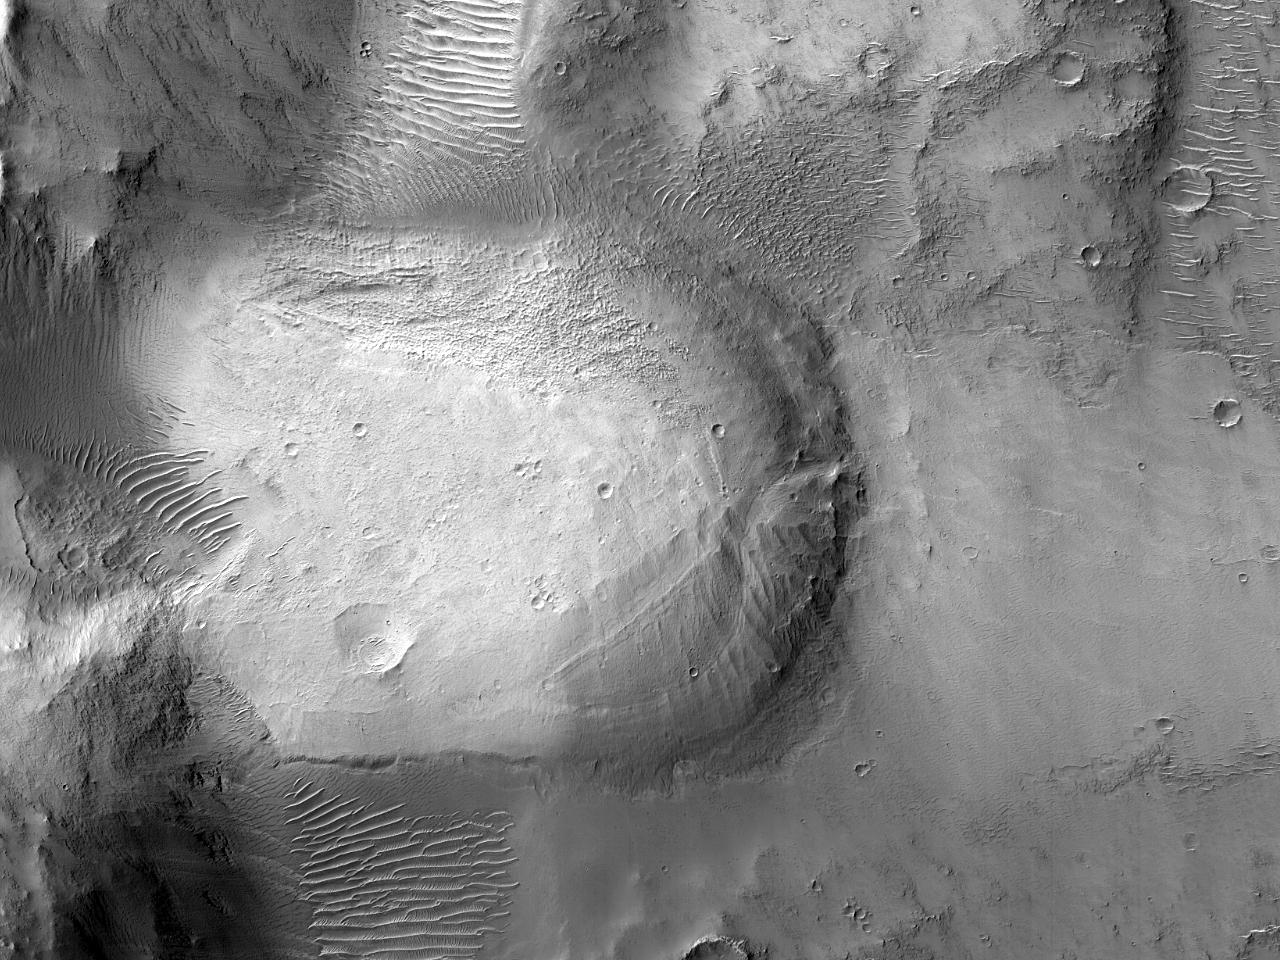 Элемент в форме лопасти на дне кратера на севере земли Arabia Terra